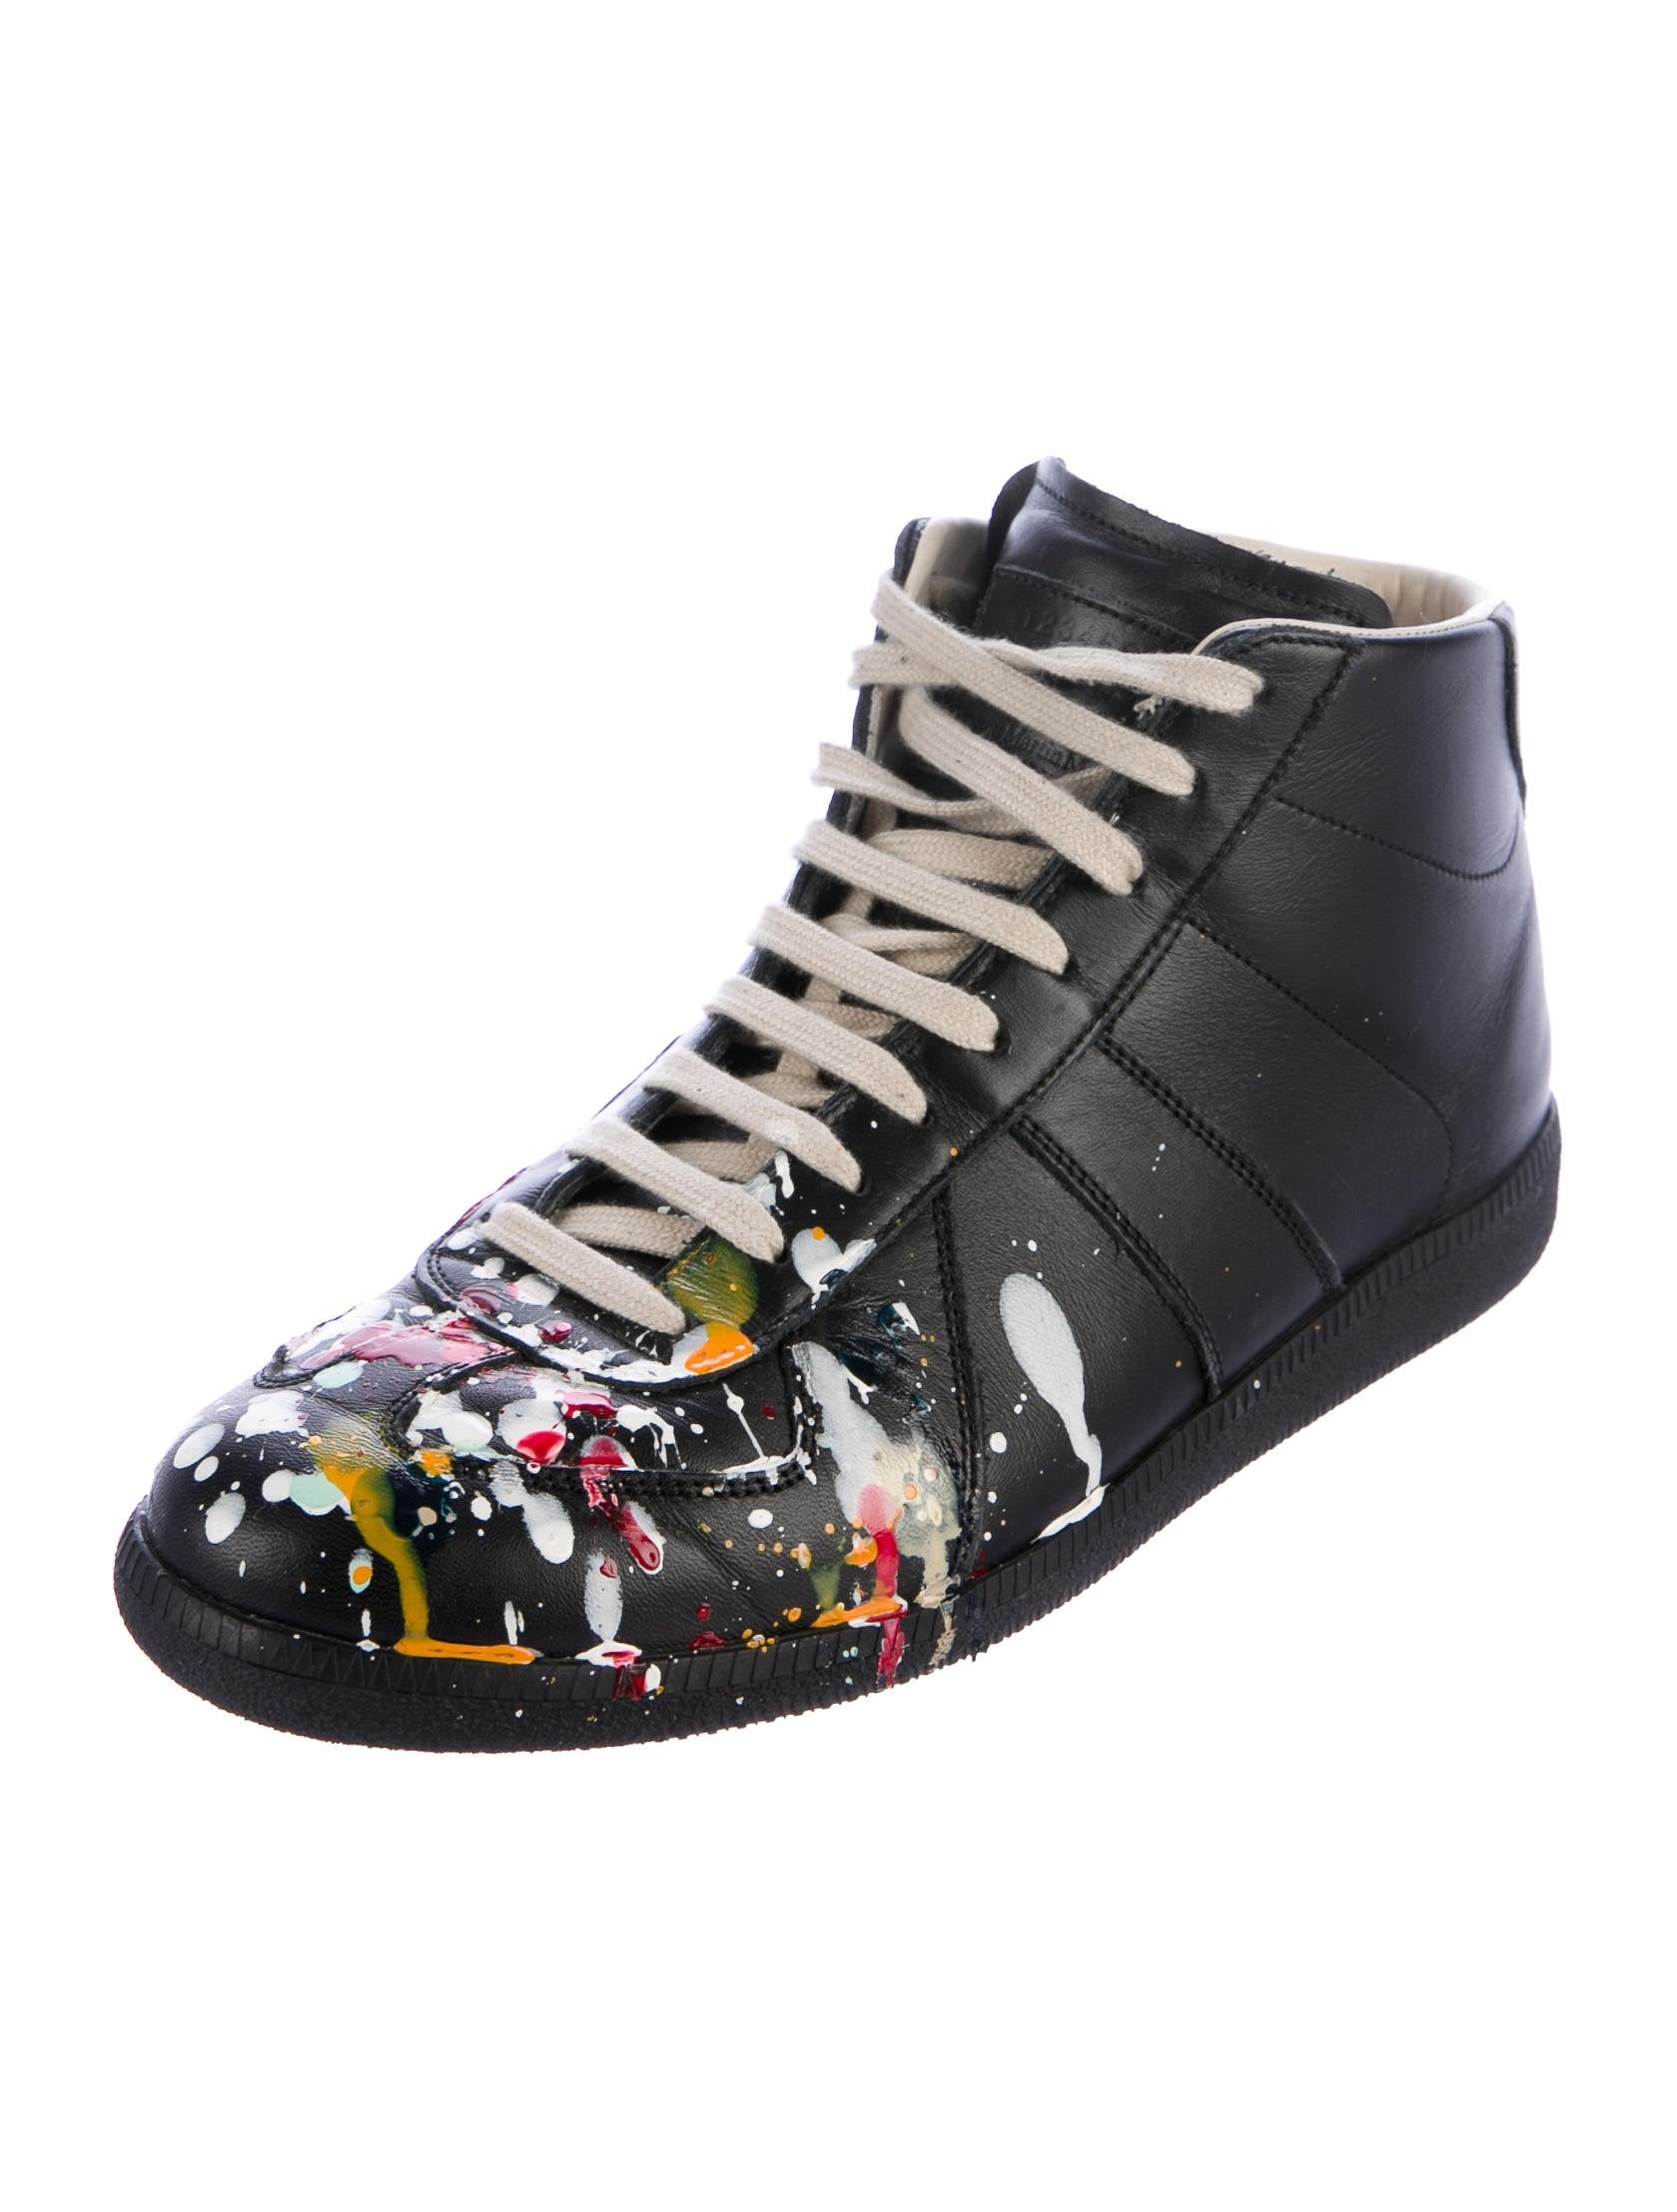 maison margiela paint splatter replica sneakers shoes mai32557 the realreal. Black Bedroom Furniture Sets. Home Design Ideas